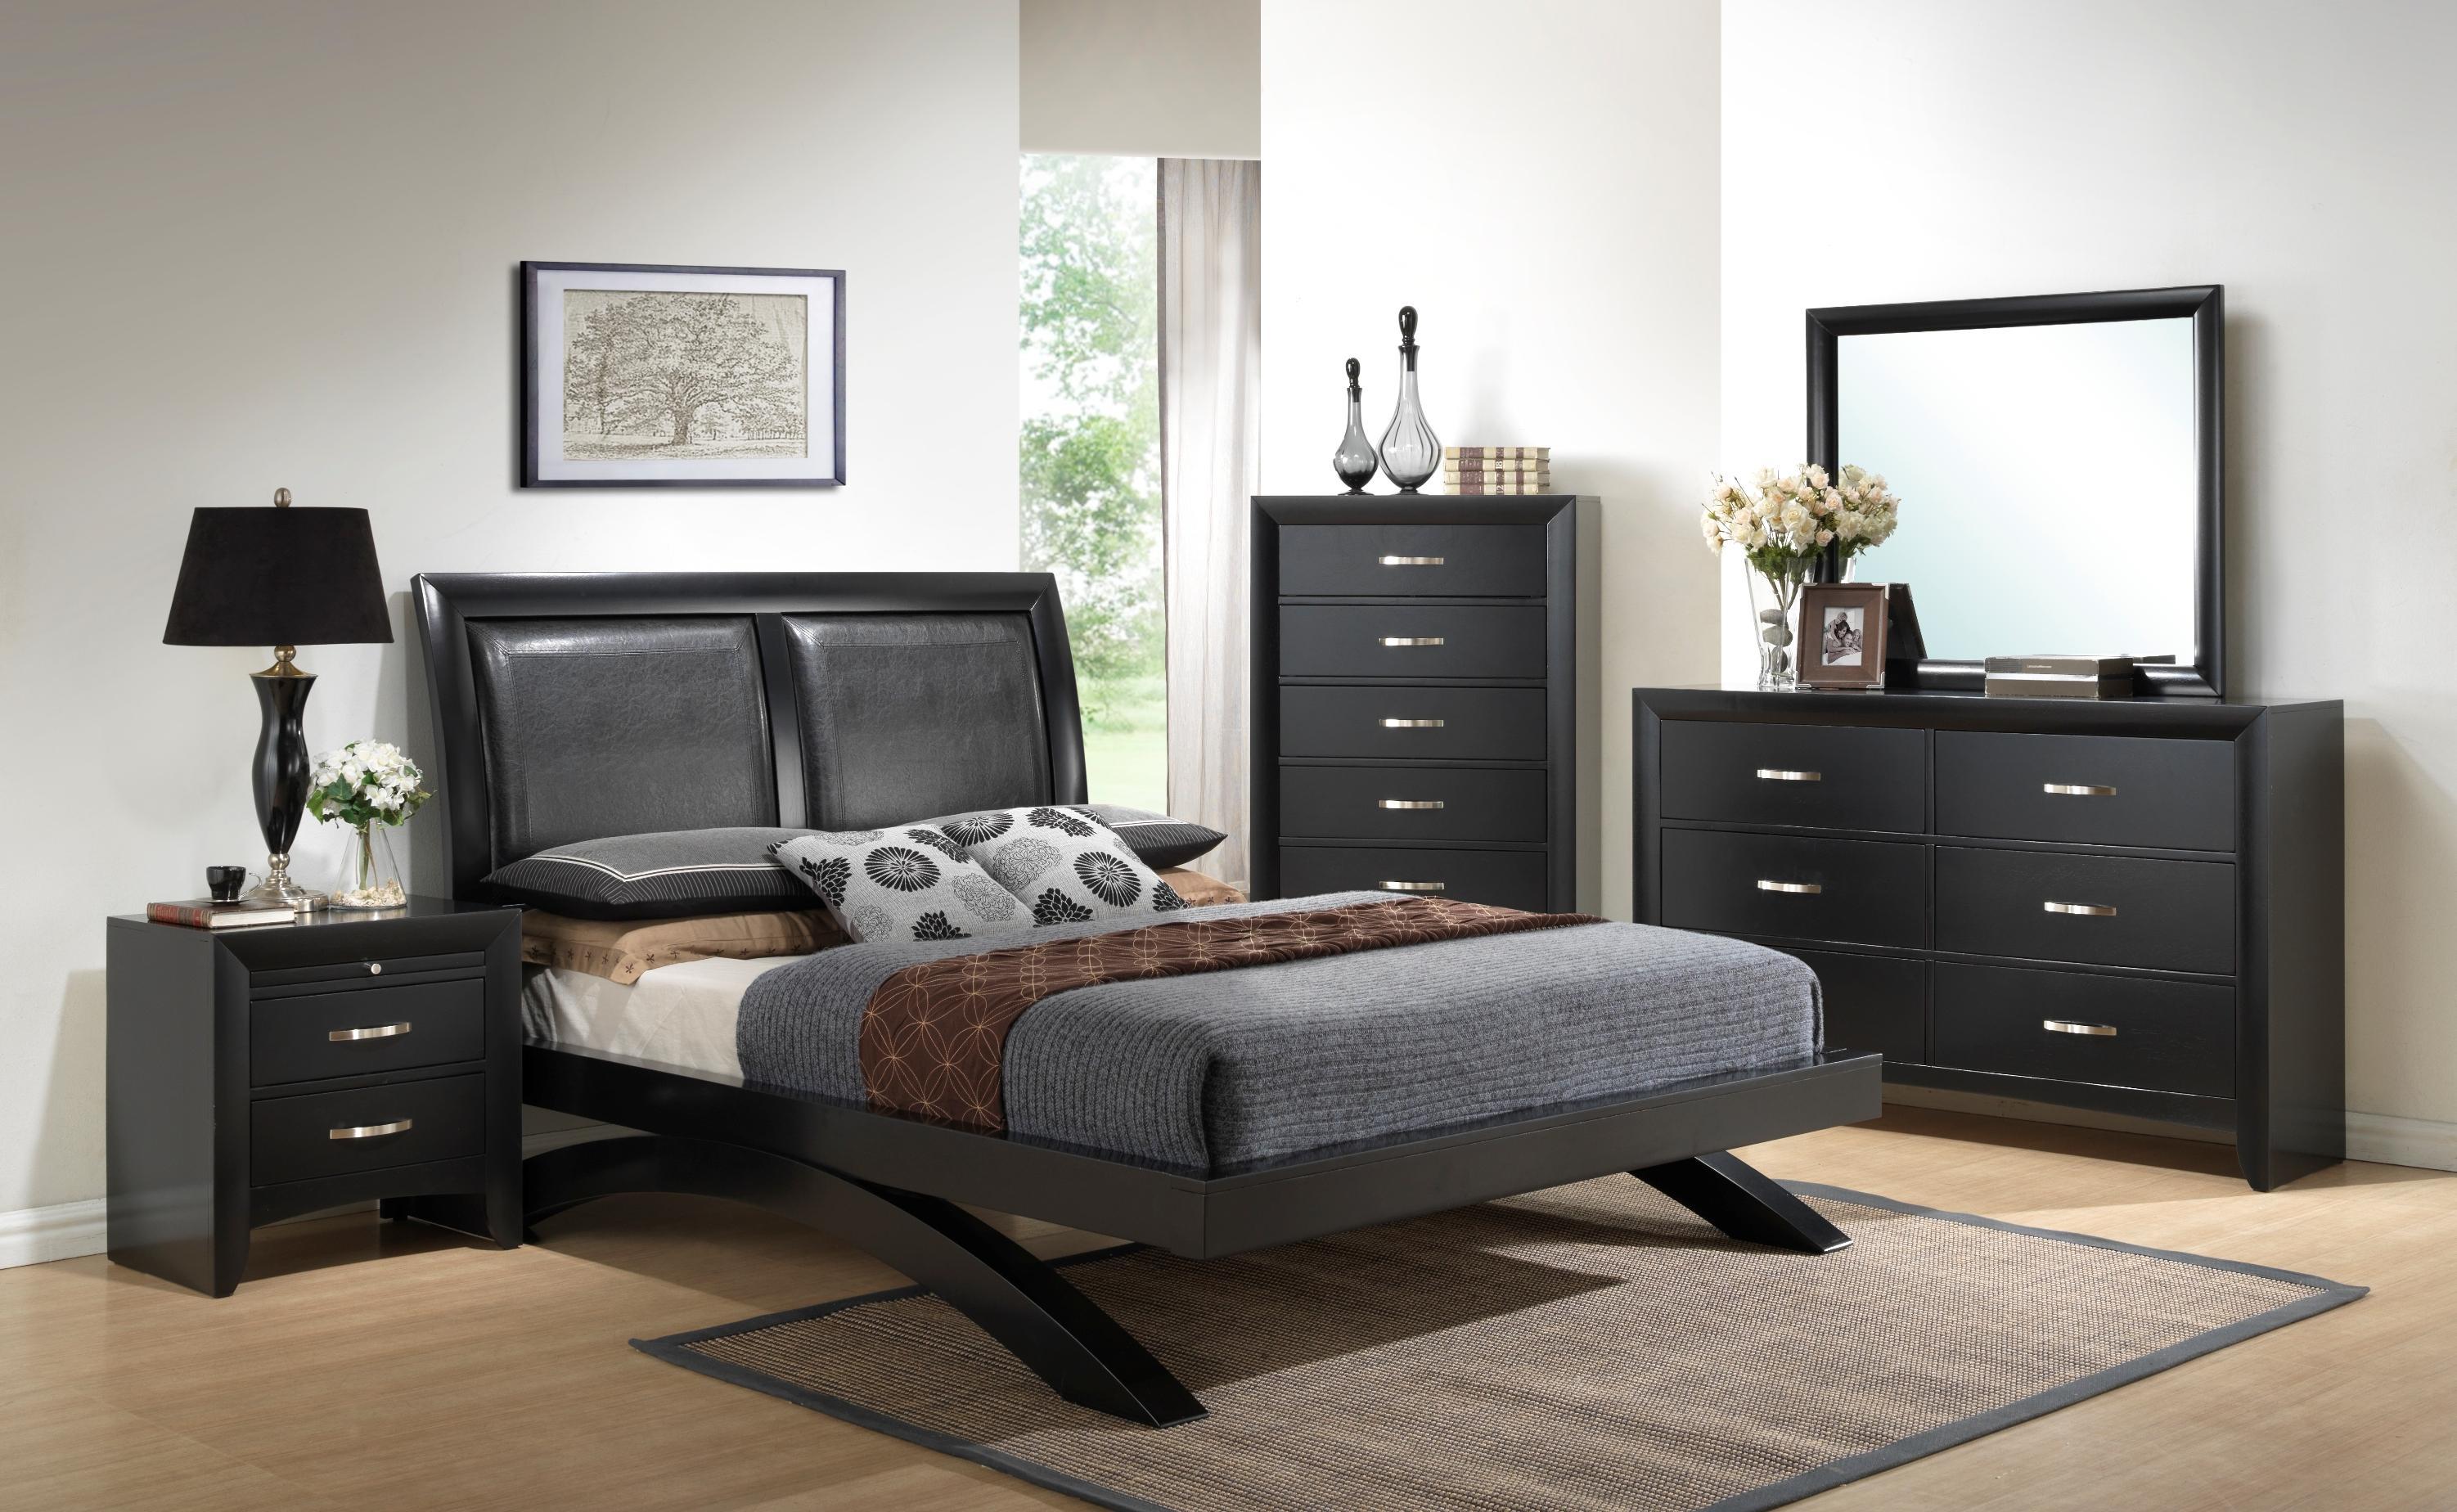 Galinda  Queen Bedroom Group  by Crown Mark at Northeast Factory Direct